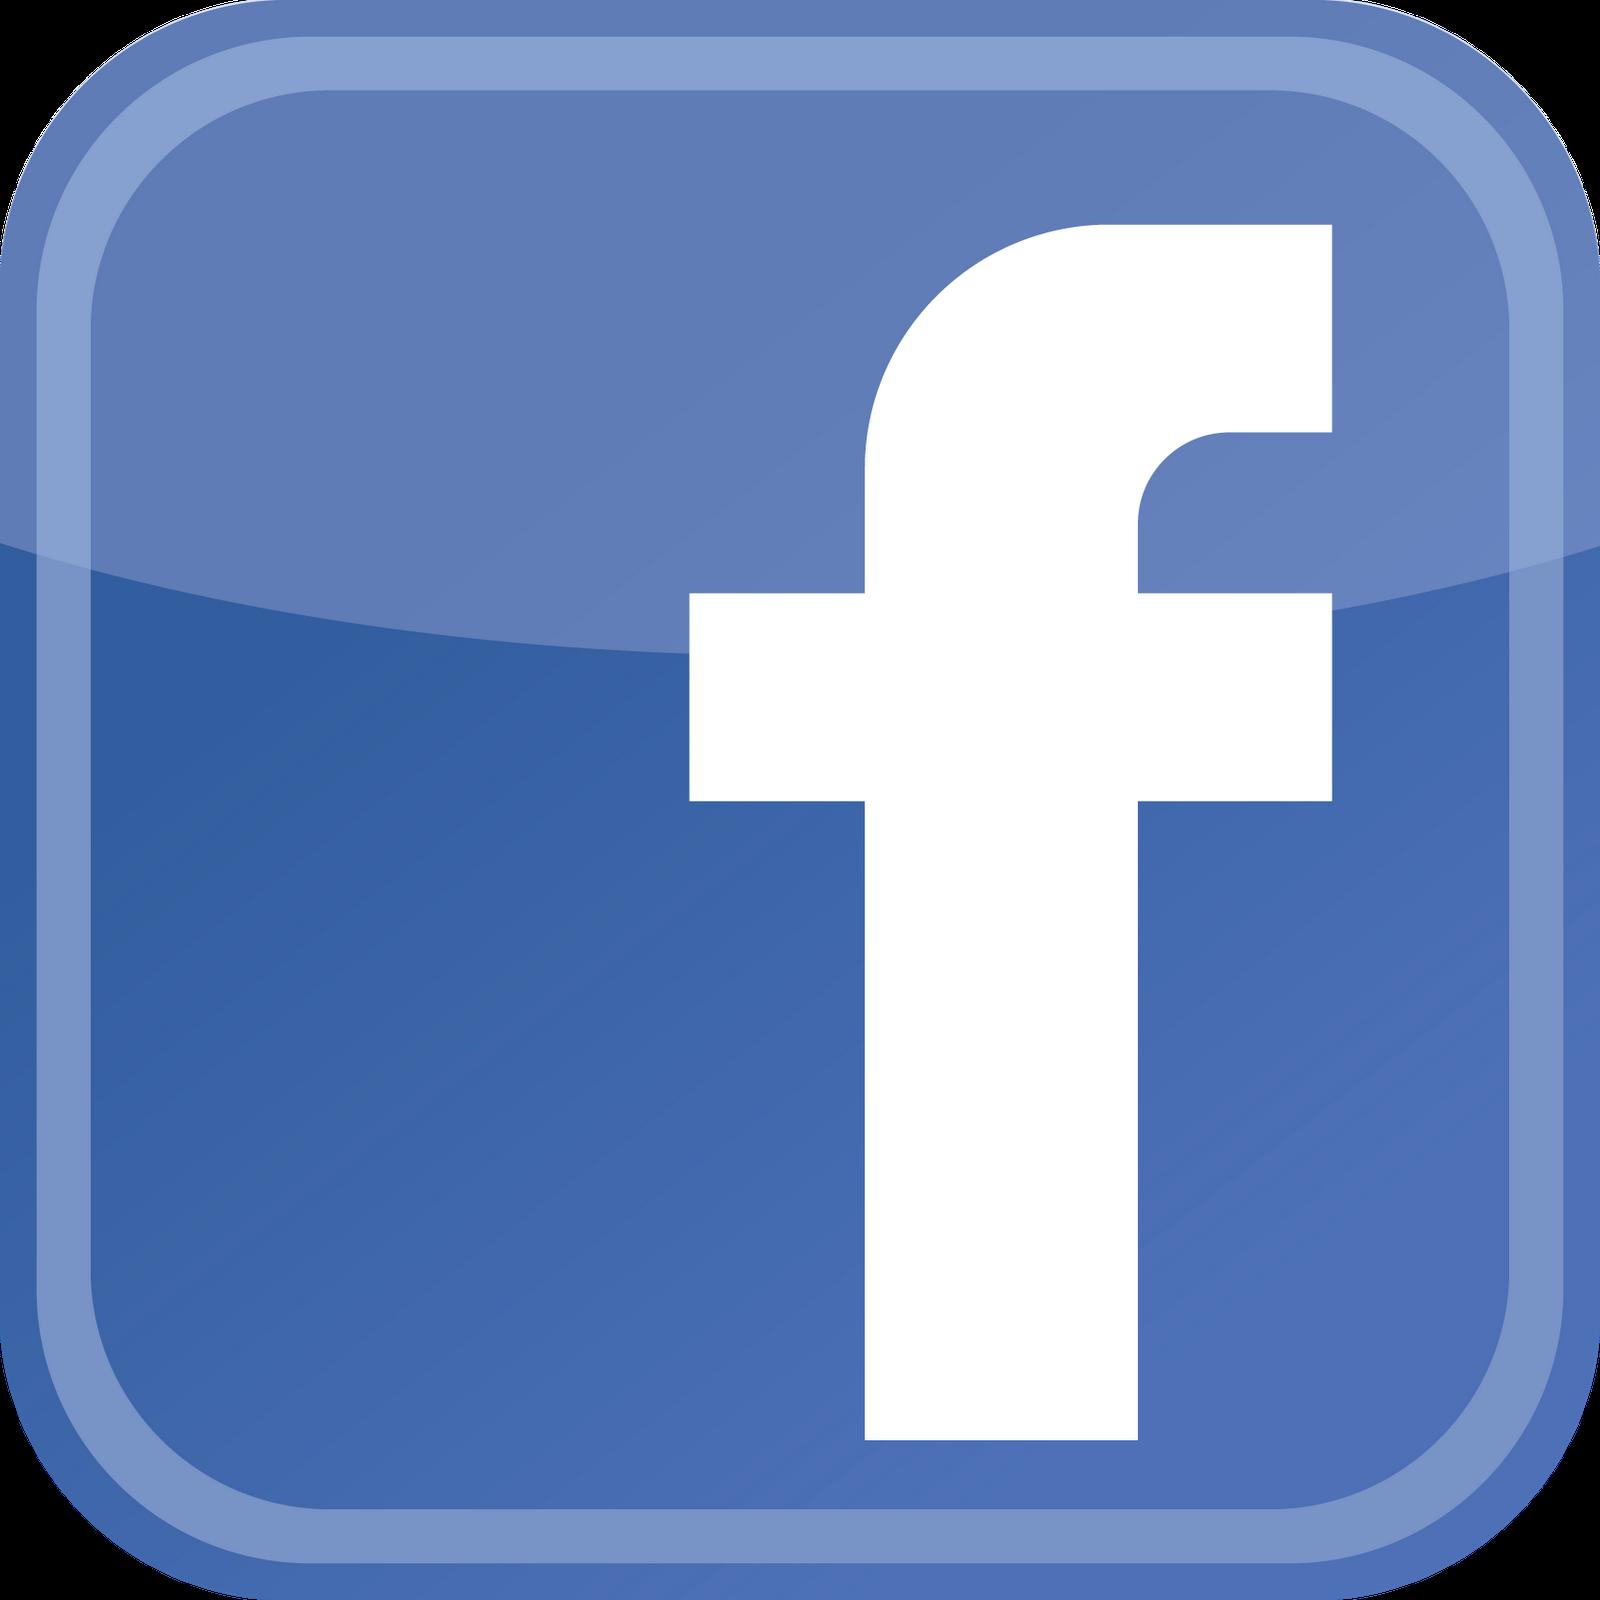 logo_facebook-80.png?nocache=1370253608546